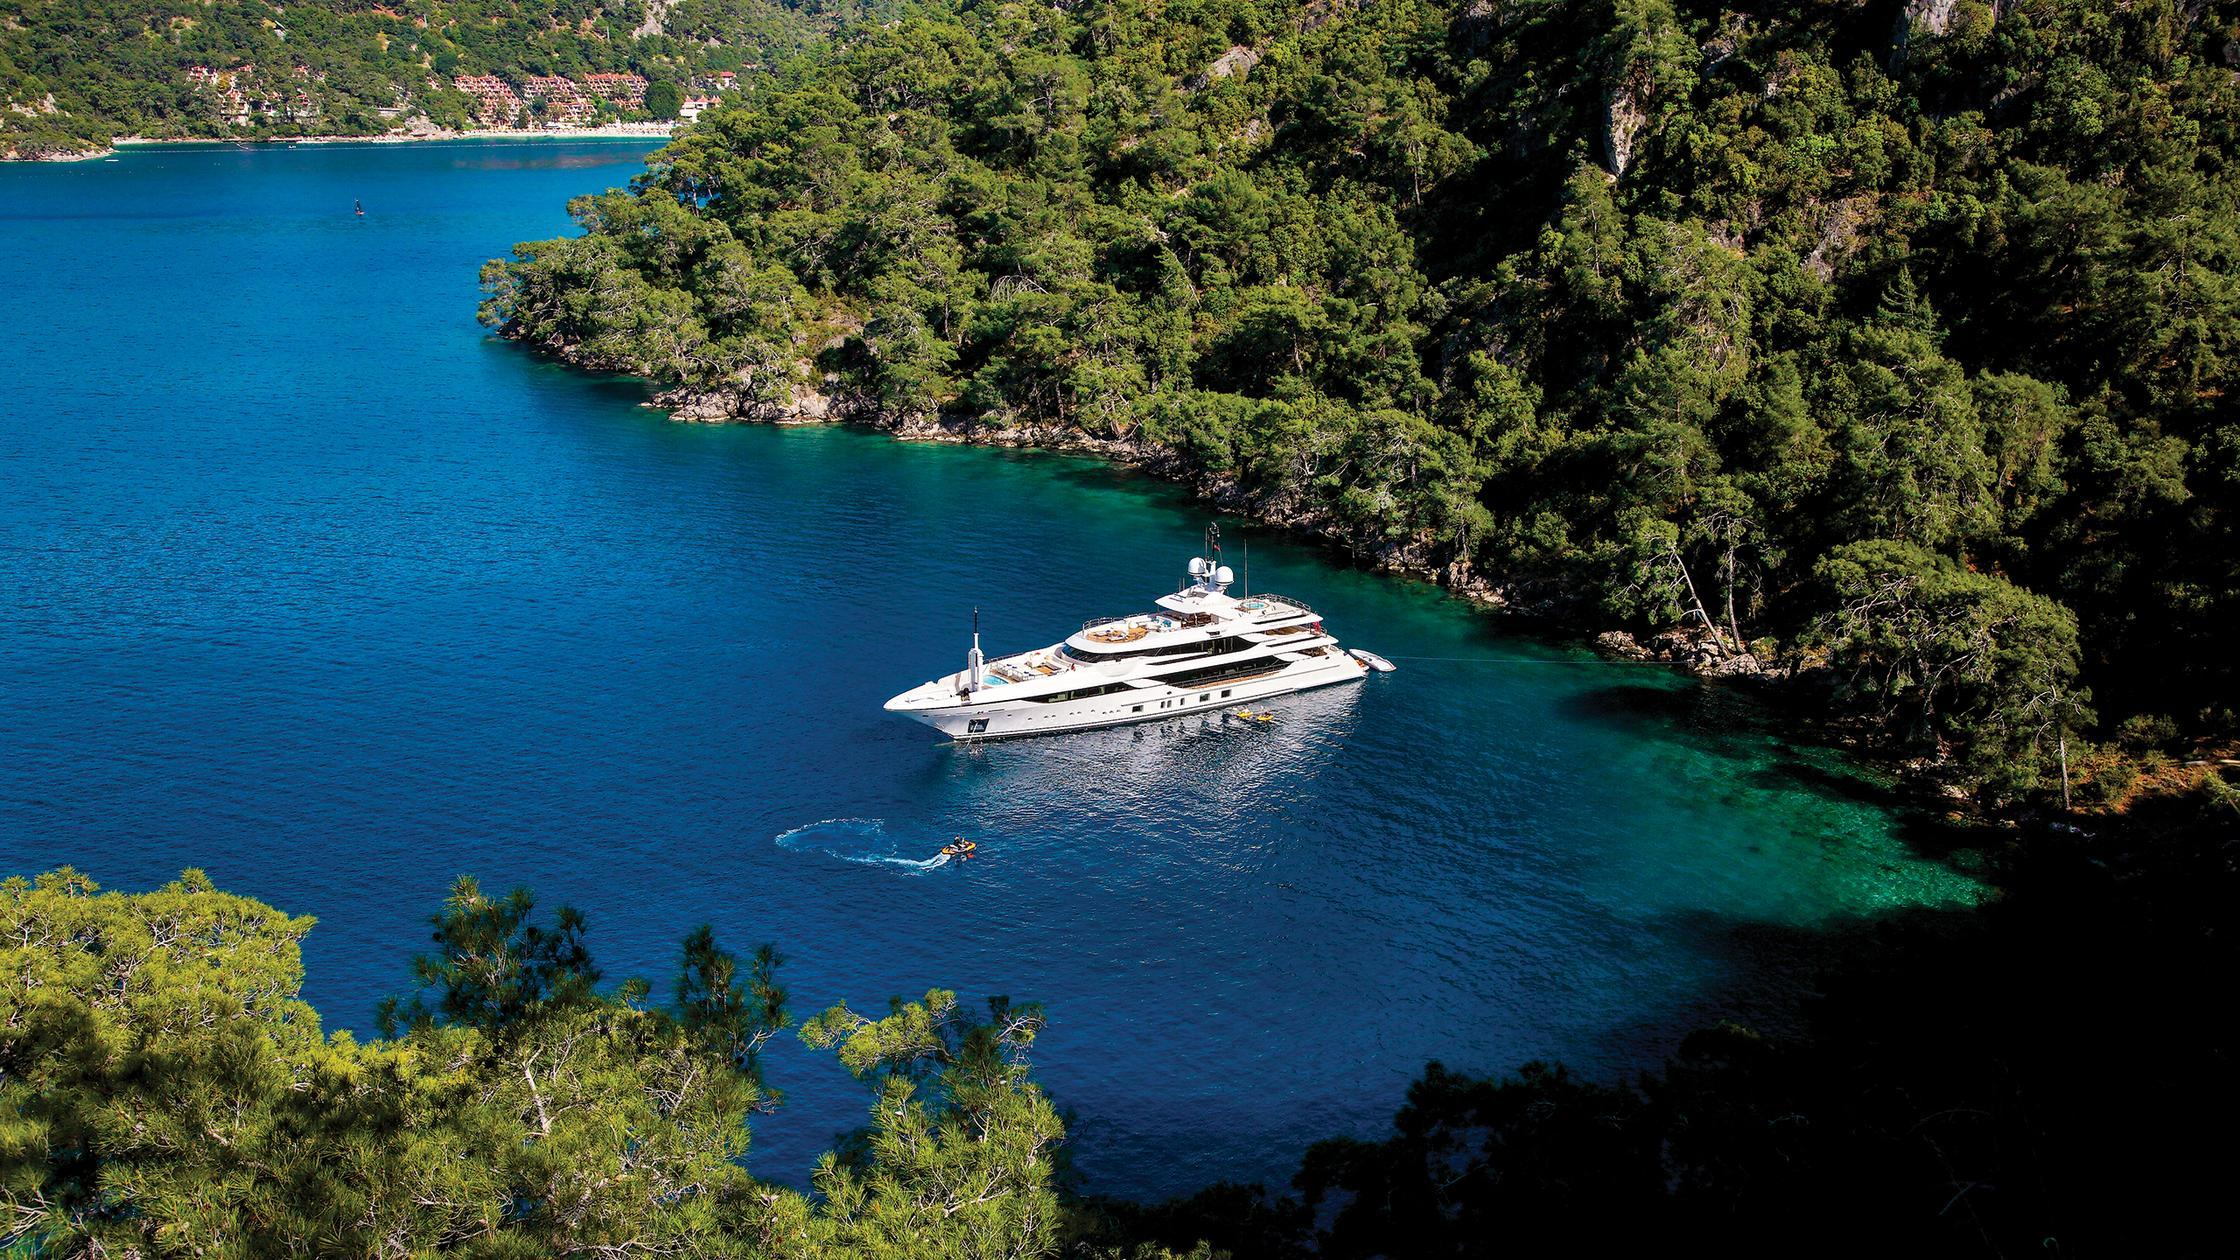 vica-motor-yacht-benetti-2015-50m-aerial-bay